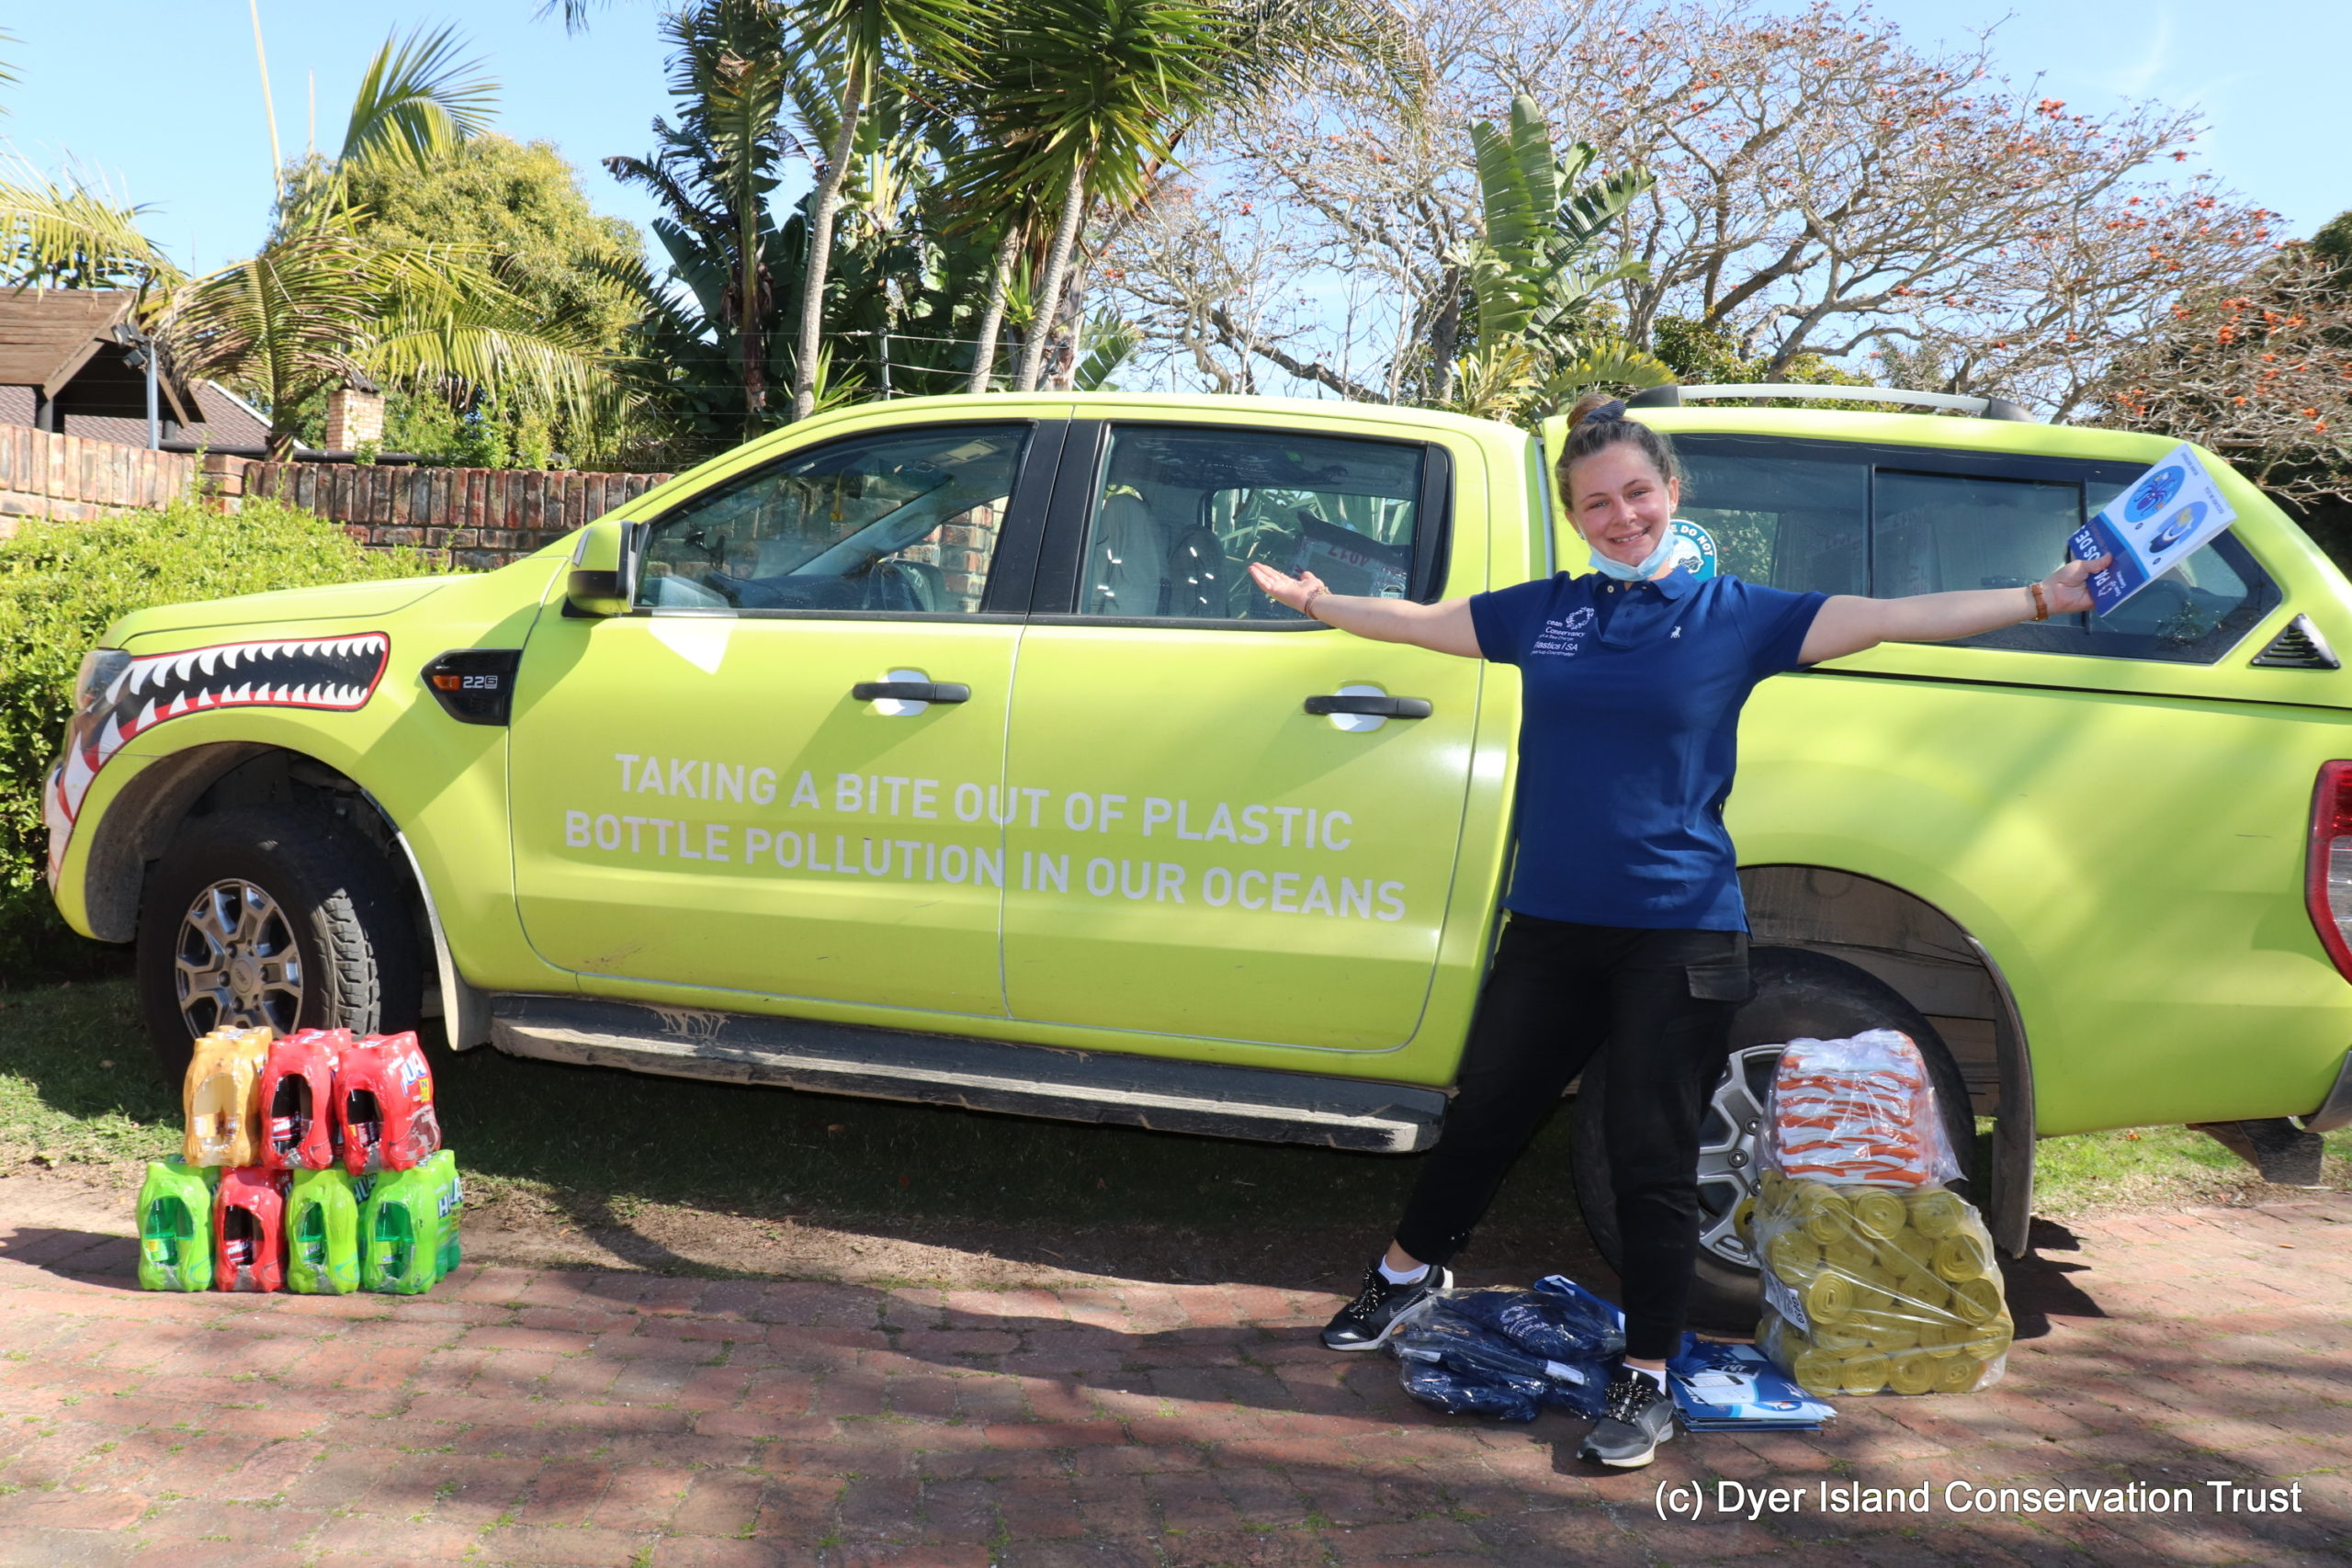 Nane AKA Charlie hits the road for marine pollution